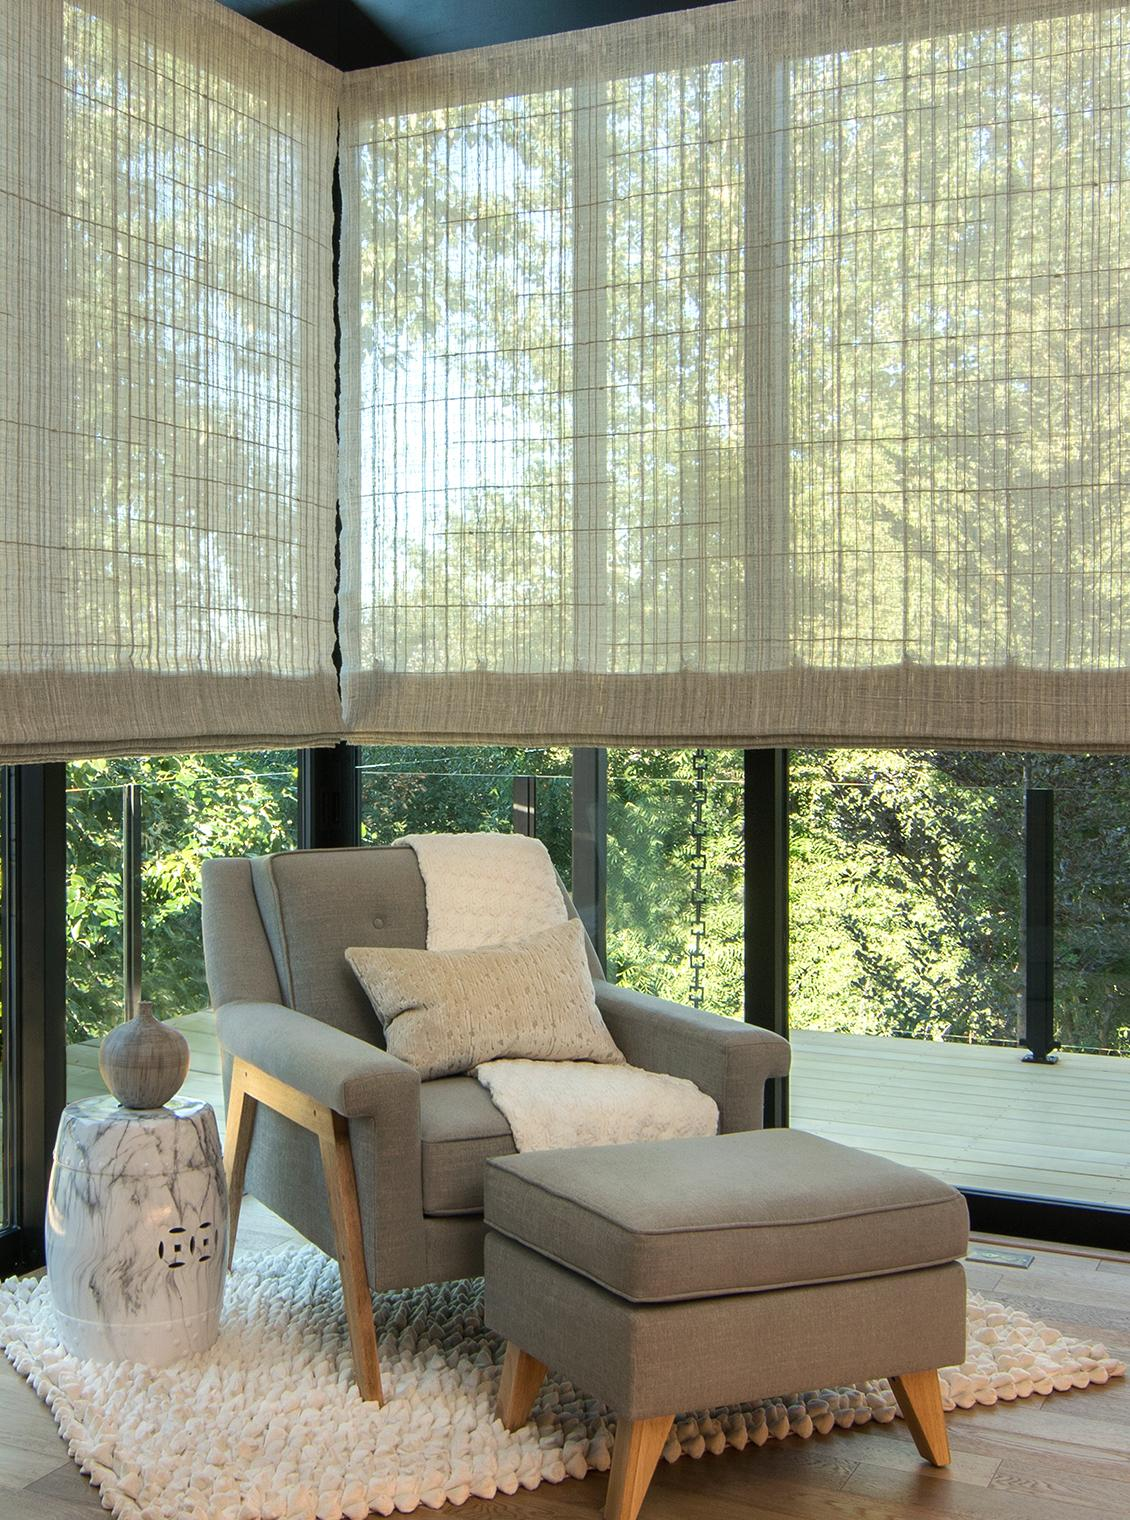 LE2536 Suteki House | Designer - Tiffany Home Designs